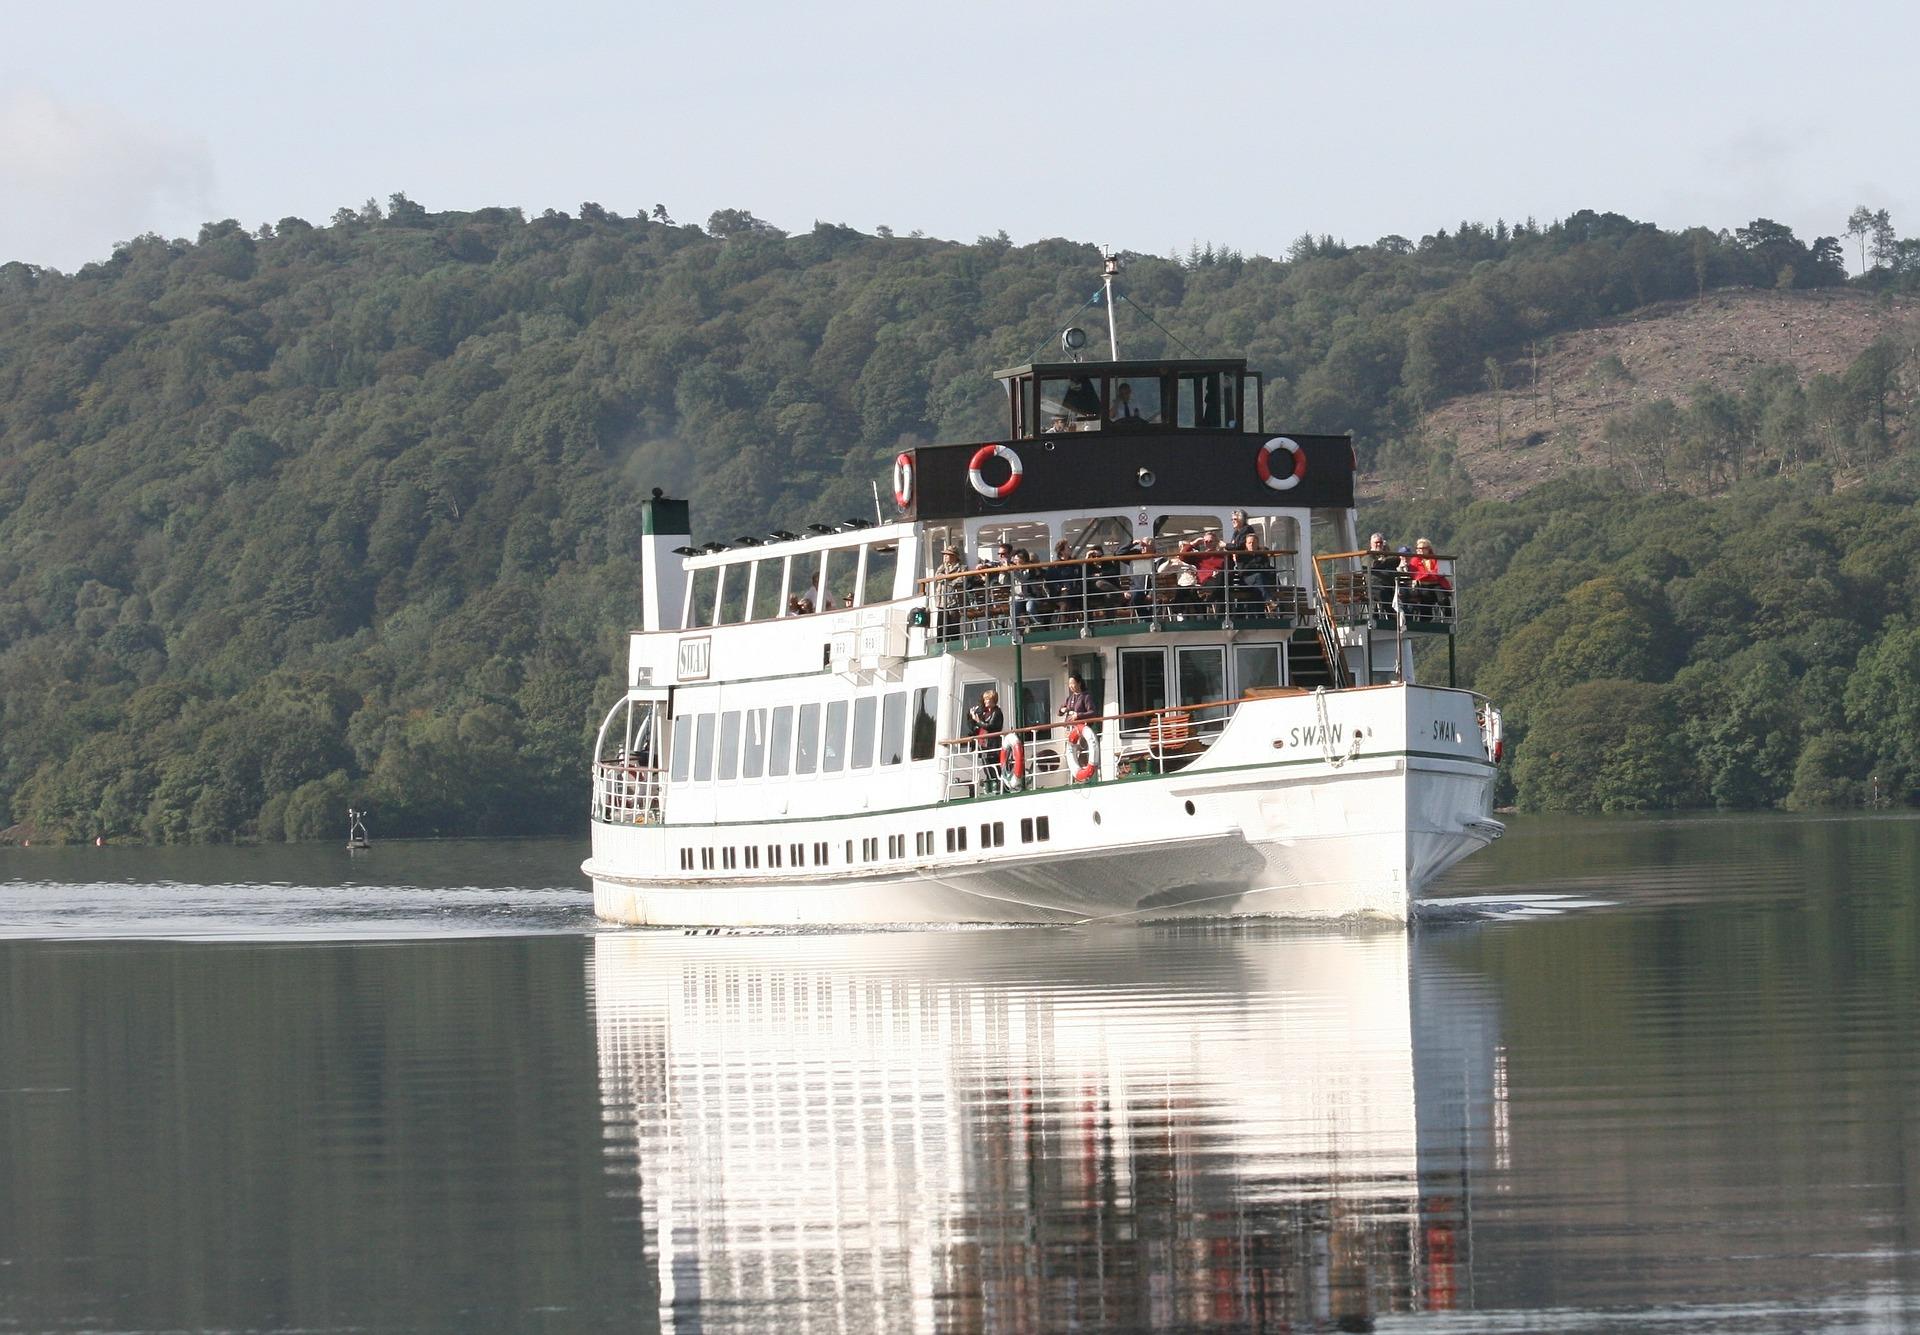 River cruise on Lake Windermere